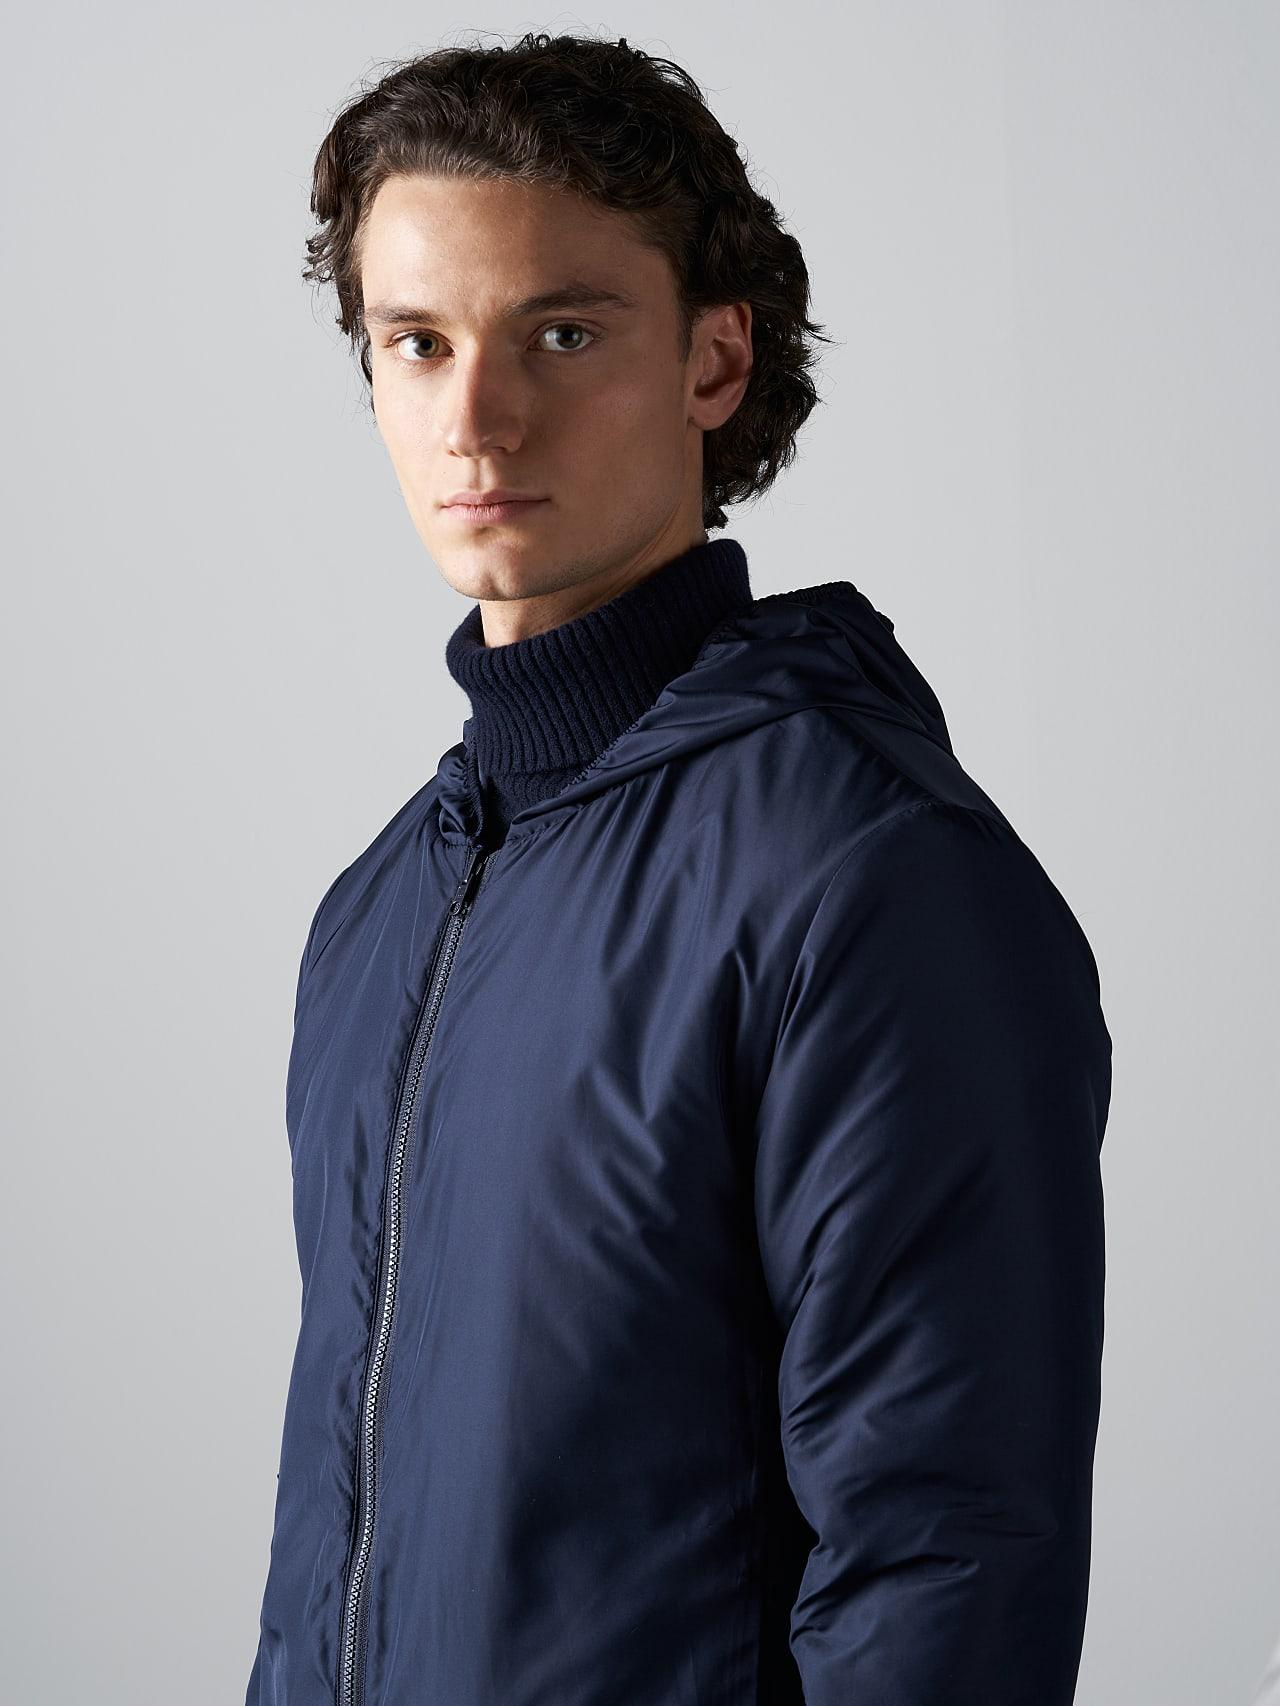 OVEDY V1.Y5.02 Reversible Wool-Blend Teddy Jacket light blue scene7.view.8.name Alpha Tauri